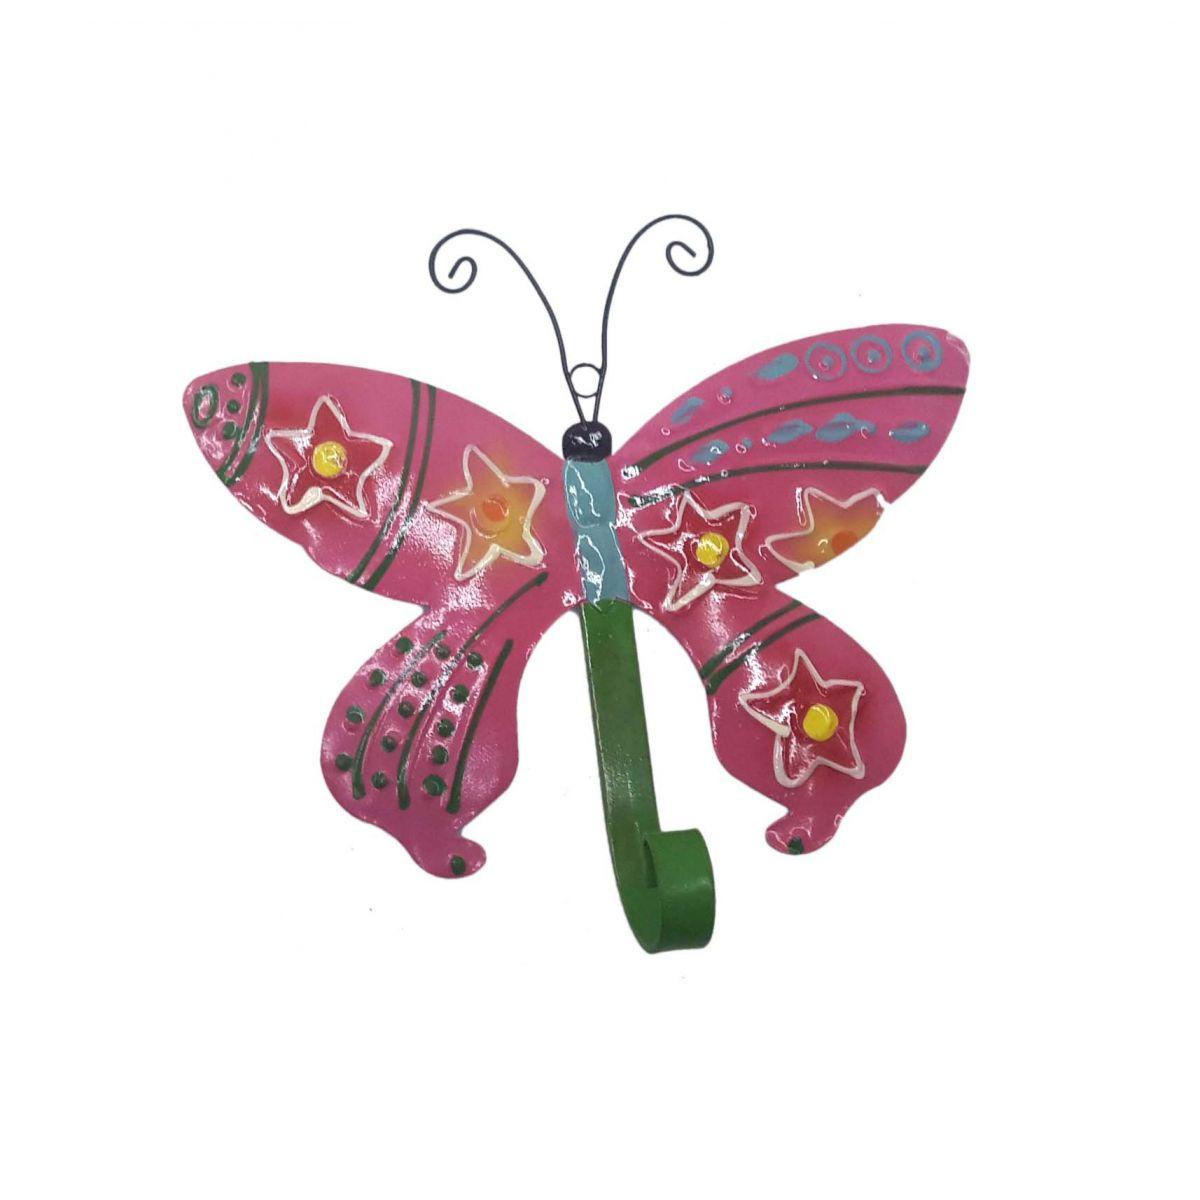 Gancho Para Chapeu Bolsa Bone De Ferro Borboleta Enfeite Pendura Rosa Com 3 Unid